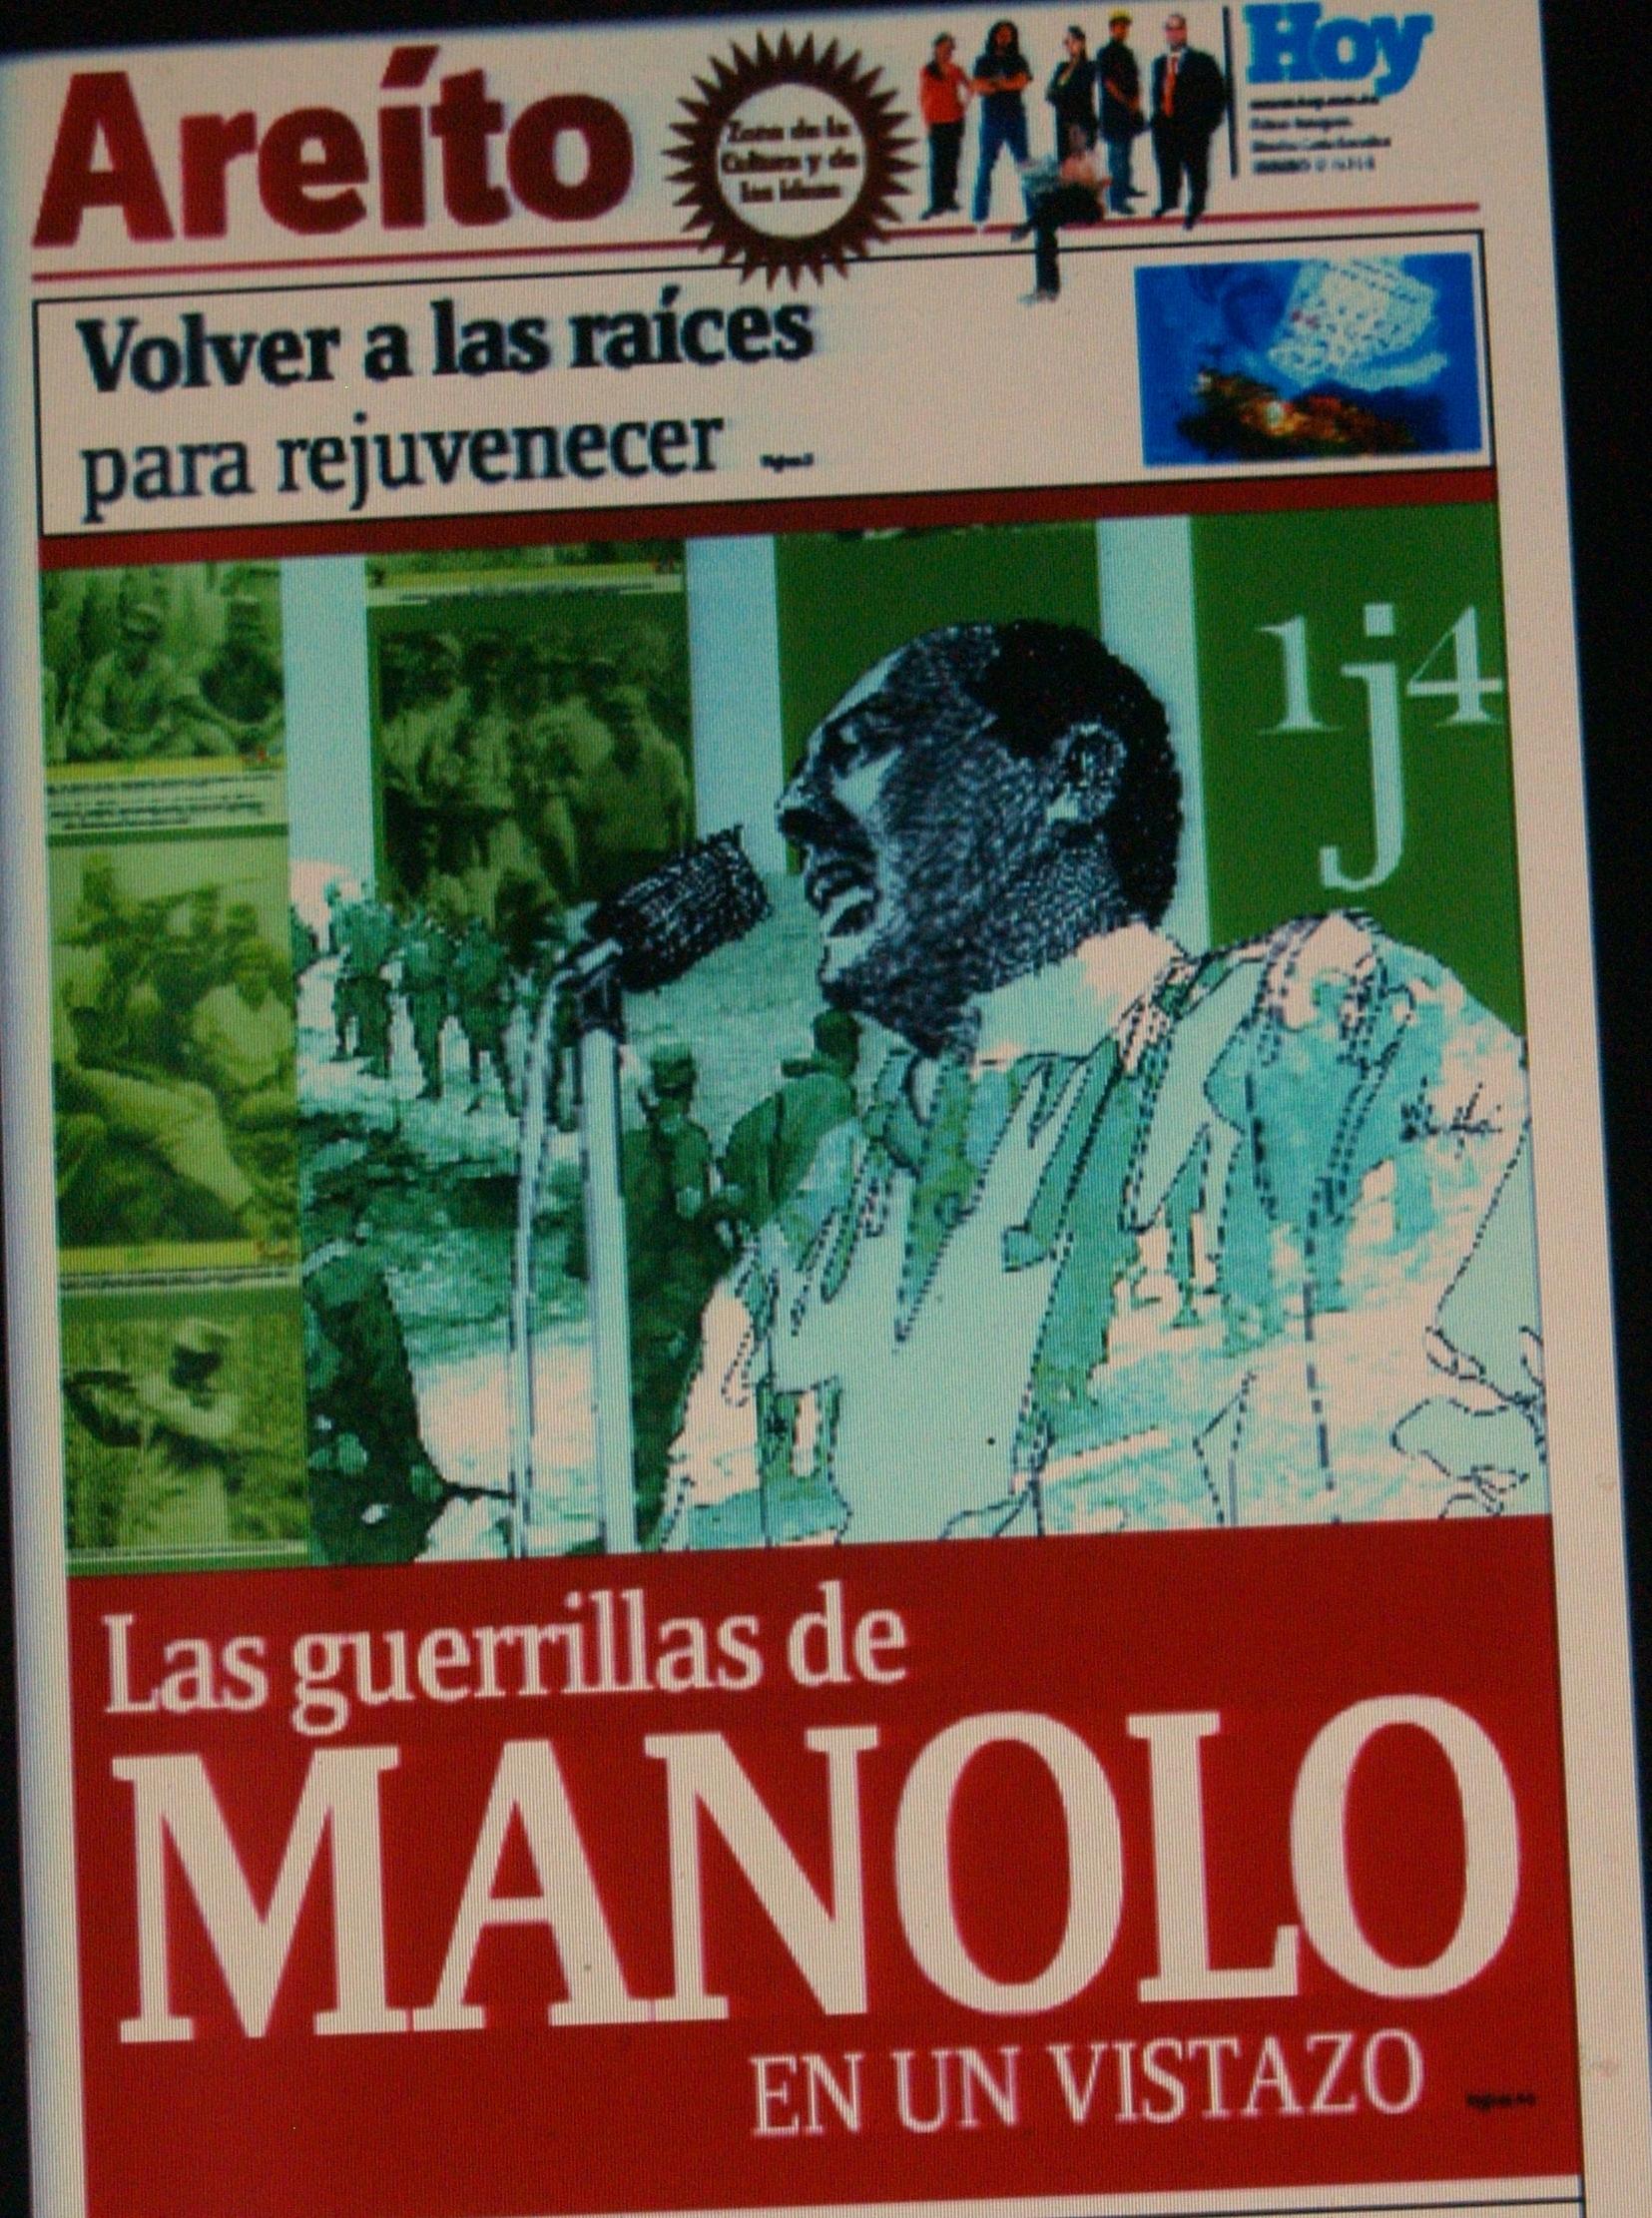 Manolo Y Ramón Manolo Y Ramon Manolo Y Ramon